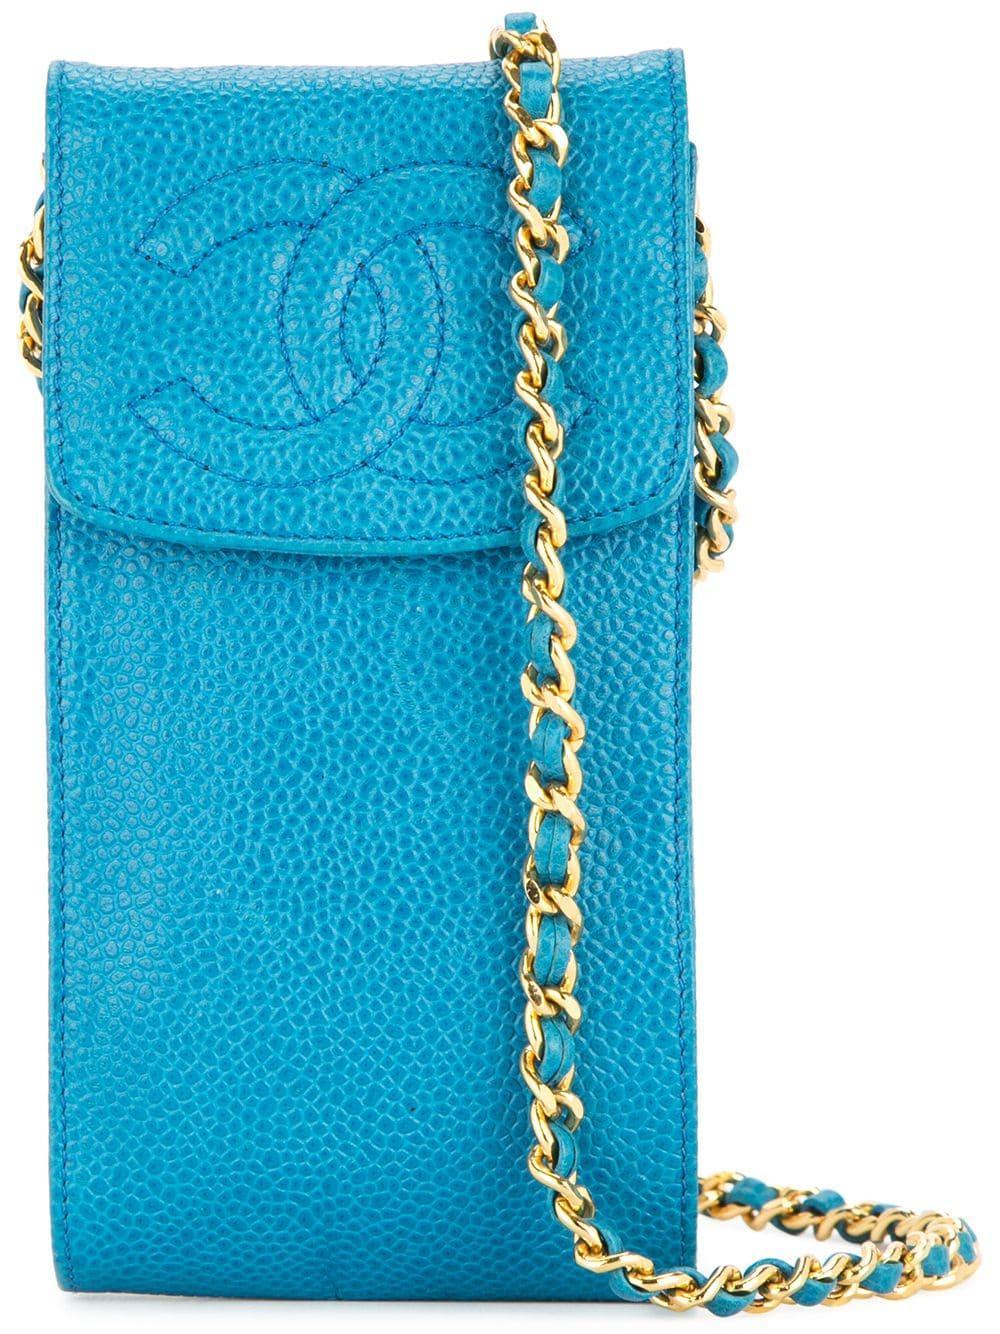 967041466bd57b Chanel Vintage Chain Shoulder Bag Phone Case - Blue | ModeSens